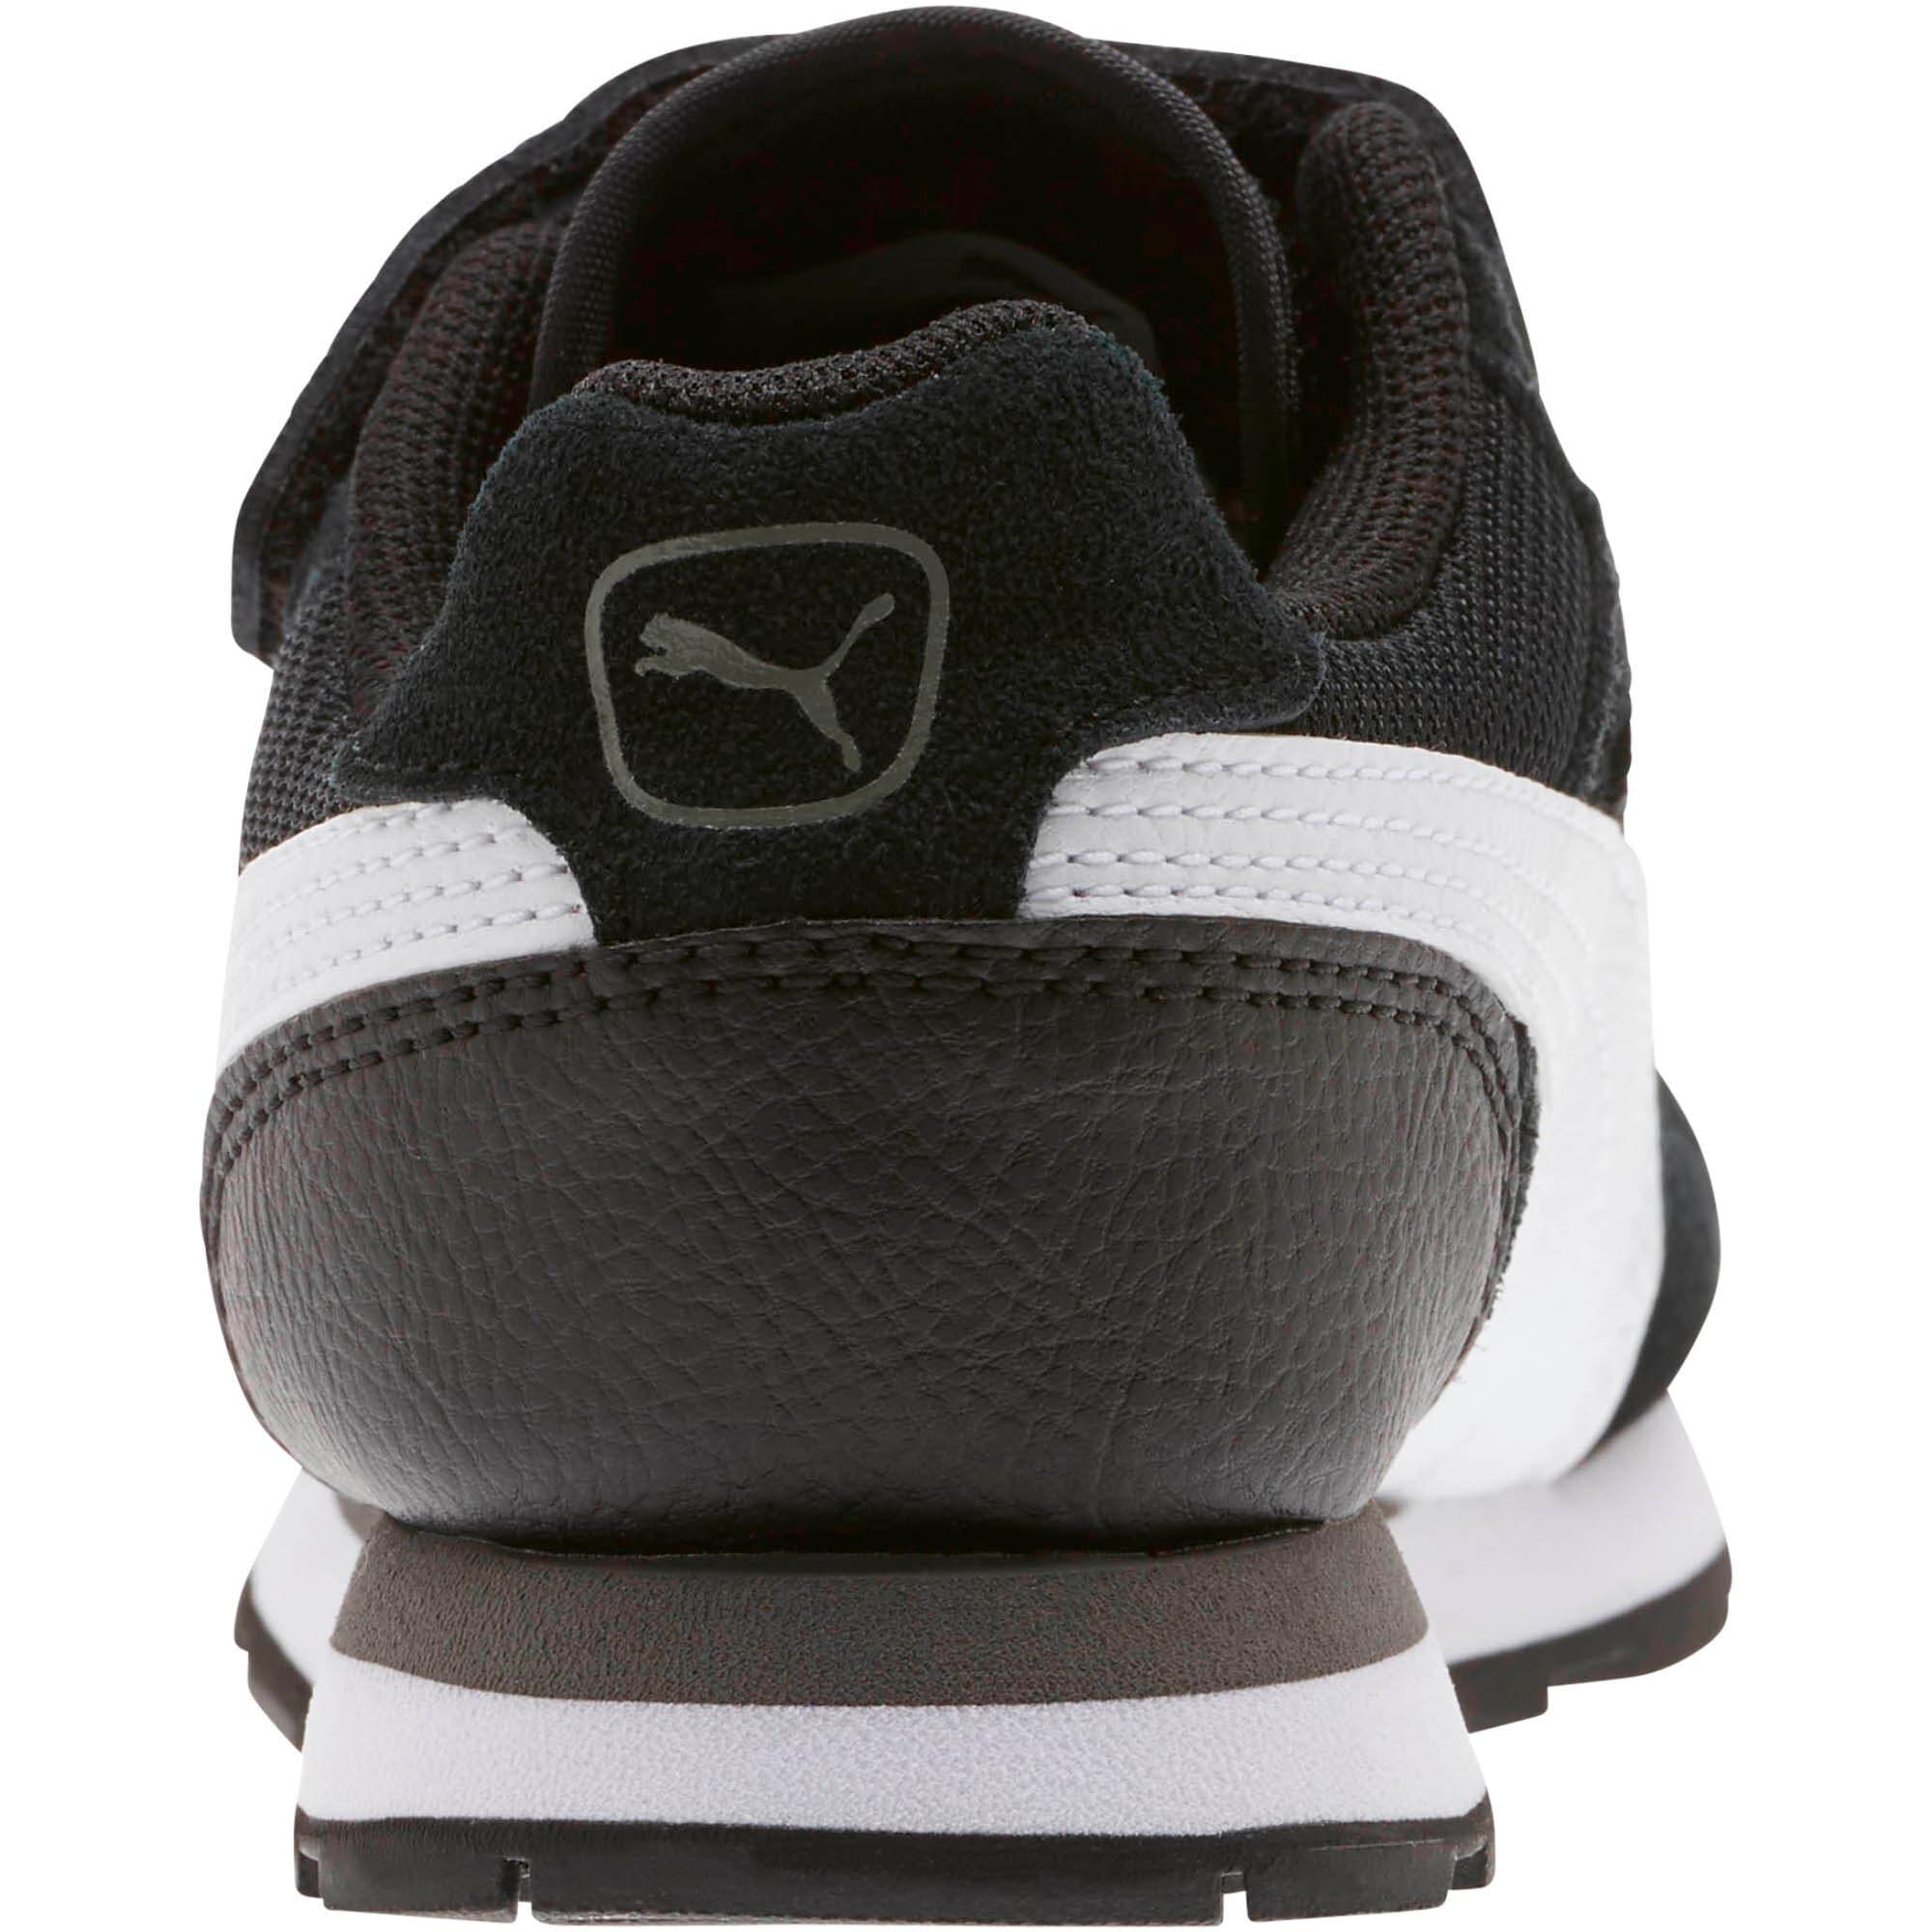 Thumbnail 4 of Vista Little Kids' Shoes, Puma Black-Puma White, medium